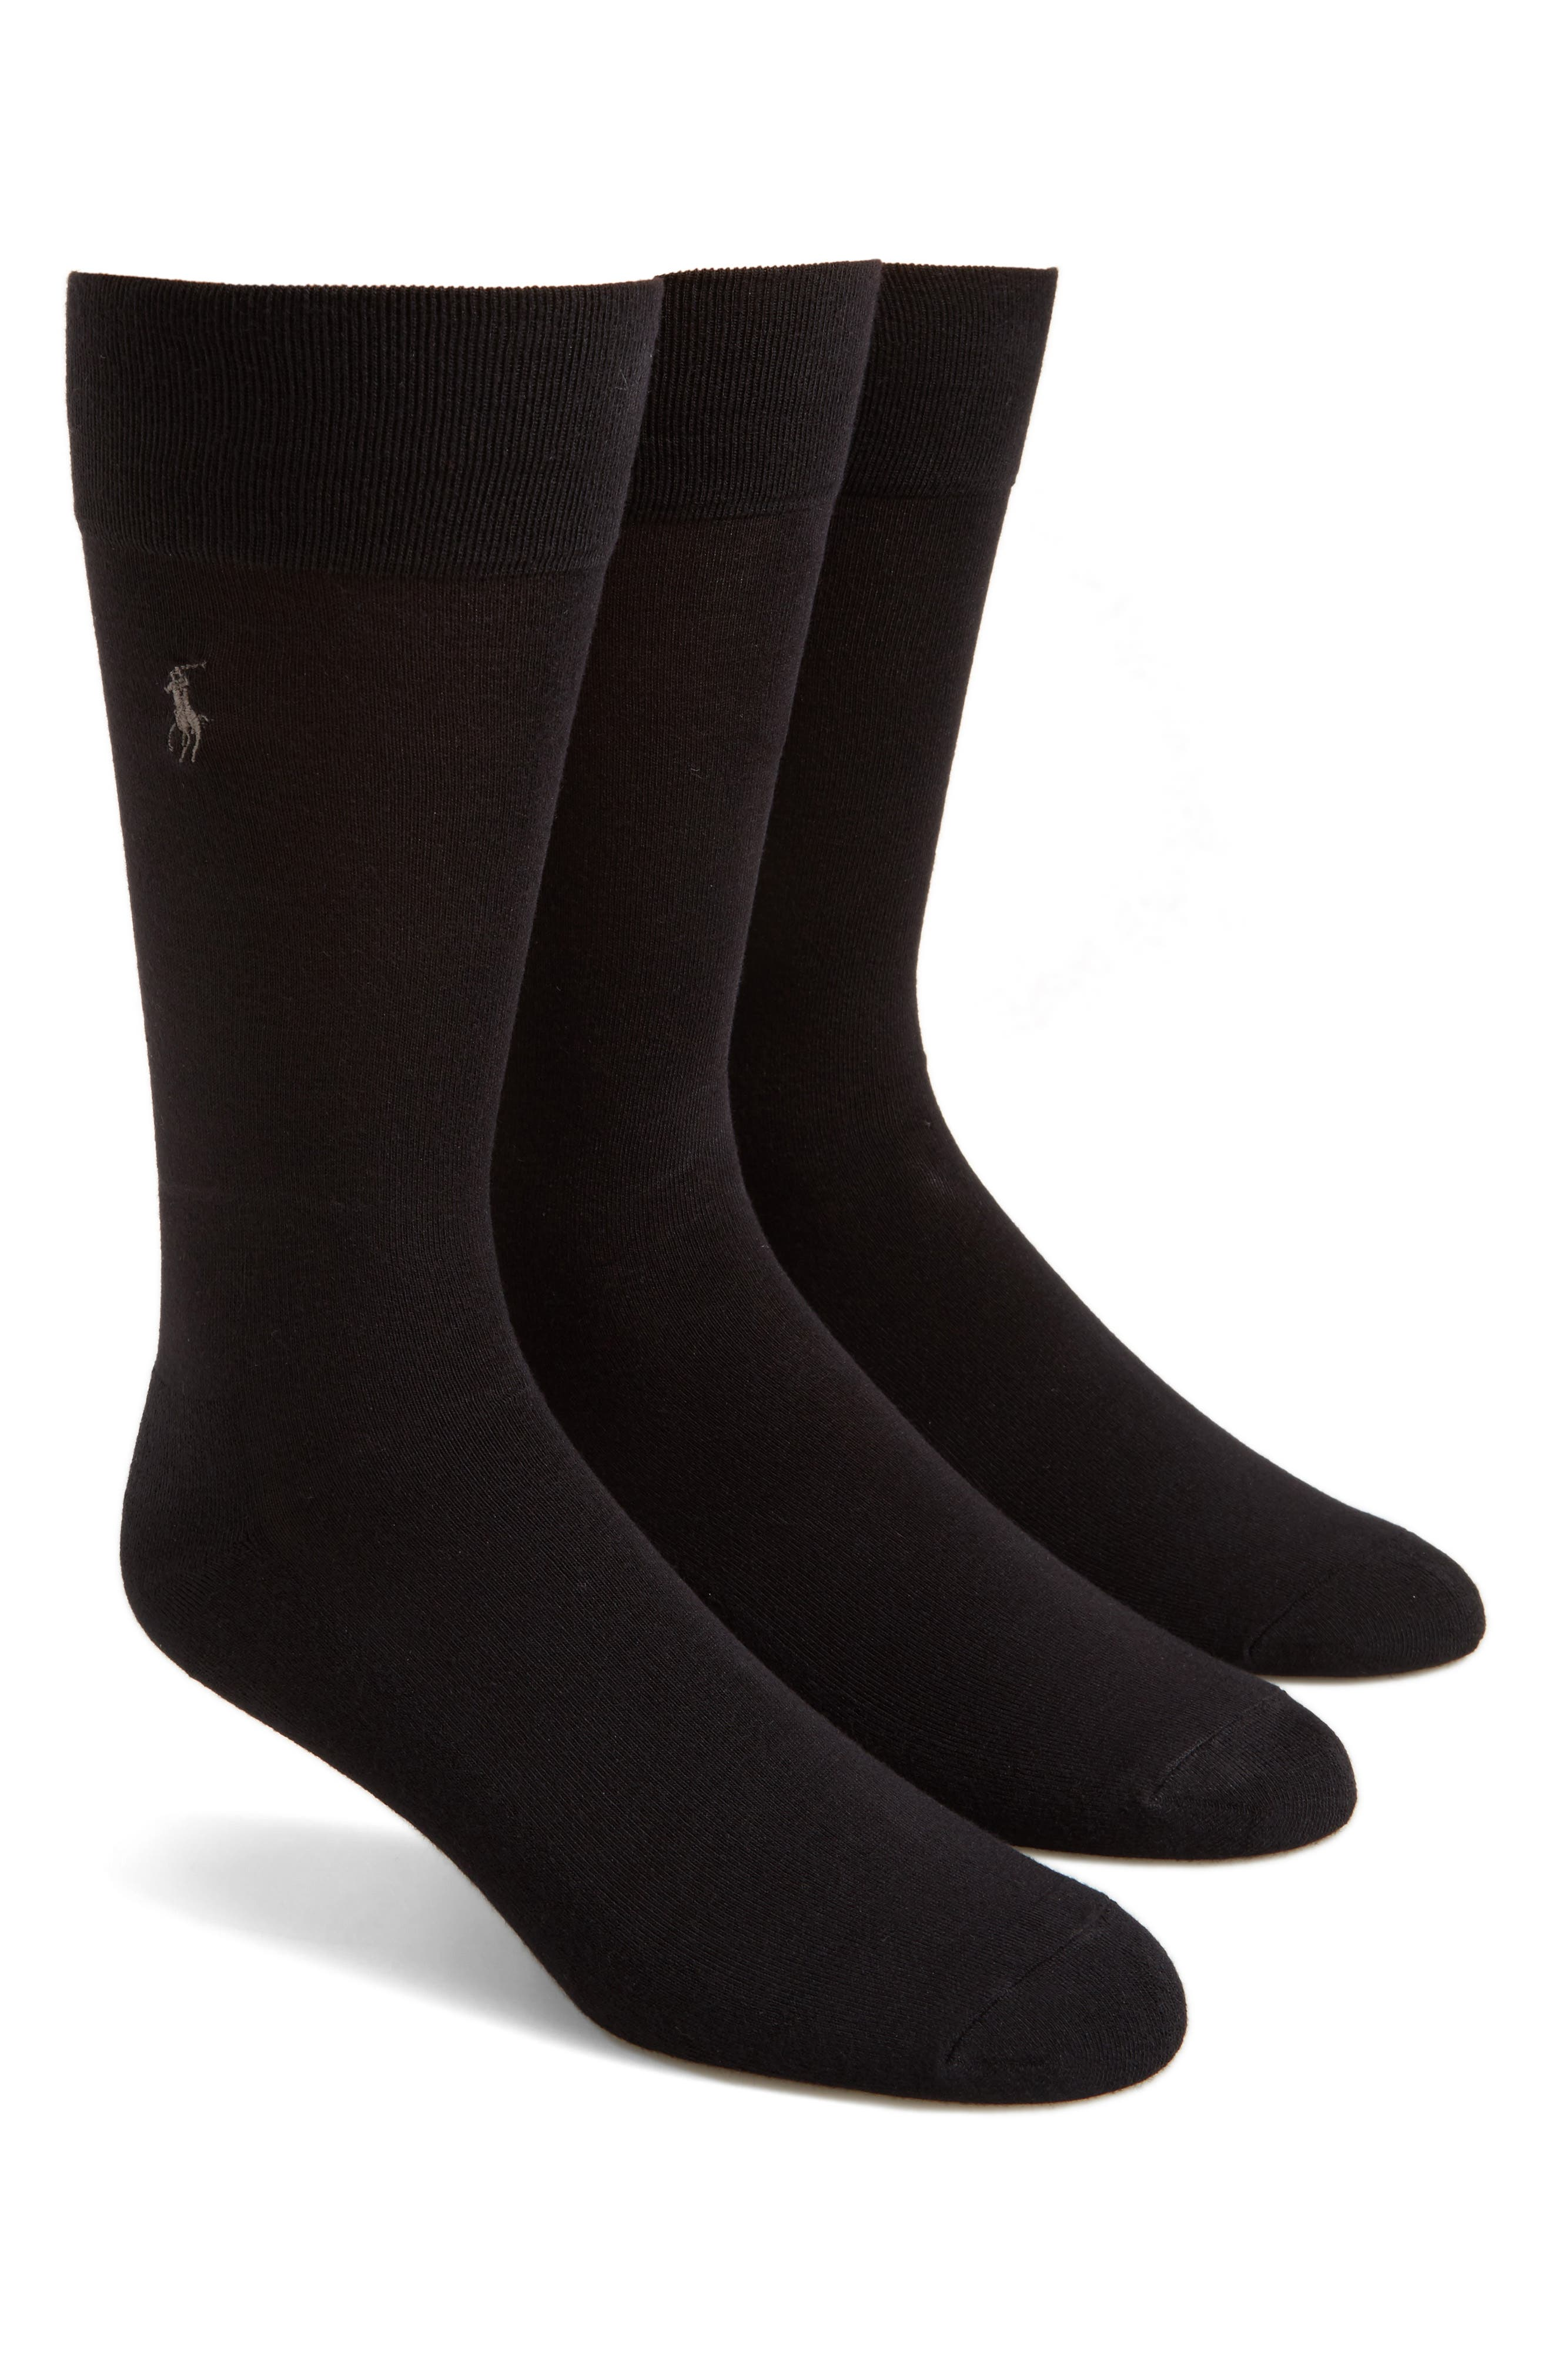 3-Pack Socks,                         Main,                         color, Black